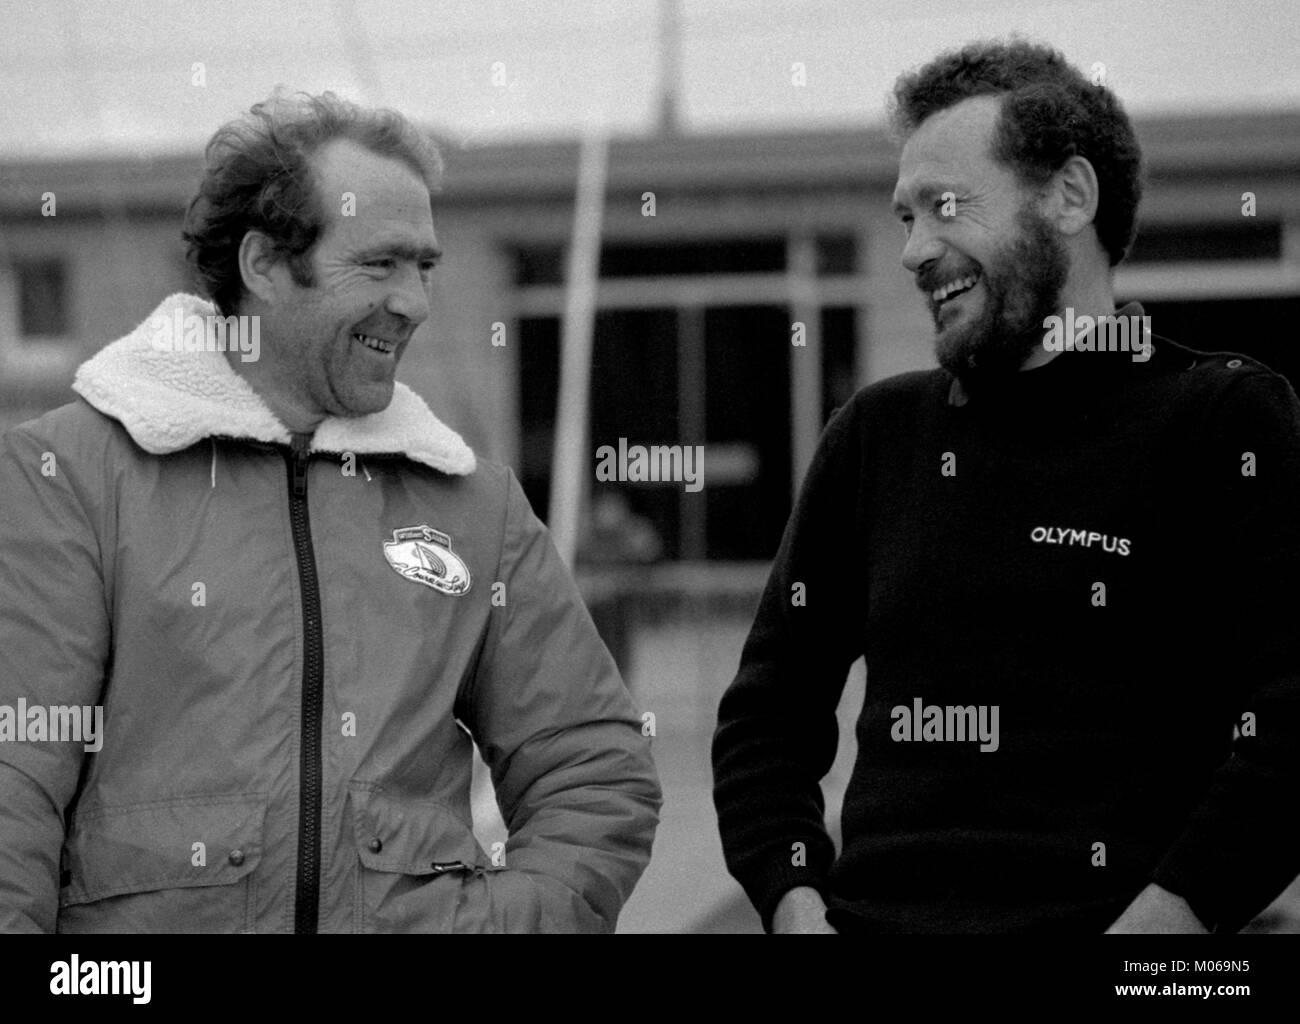 AJAXNETPHOTO. 29TH OCTOBER, 1982. ST.MALO, FRANCE. - ROUTE DU RHUM YACHT RACE  - (L-R) FRENCH SOLO SKIPPER EUGENE - Stock Image